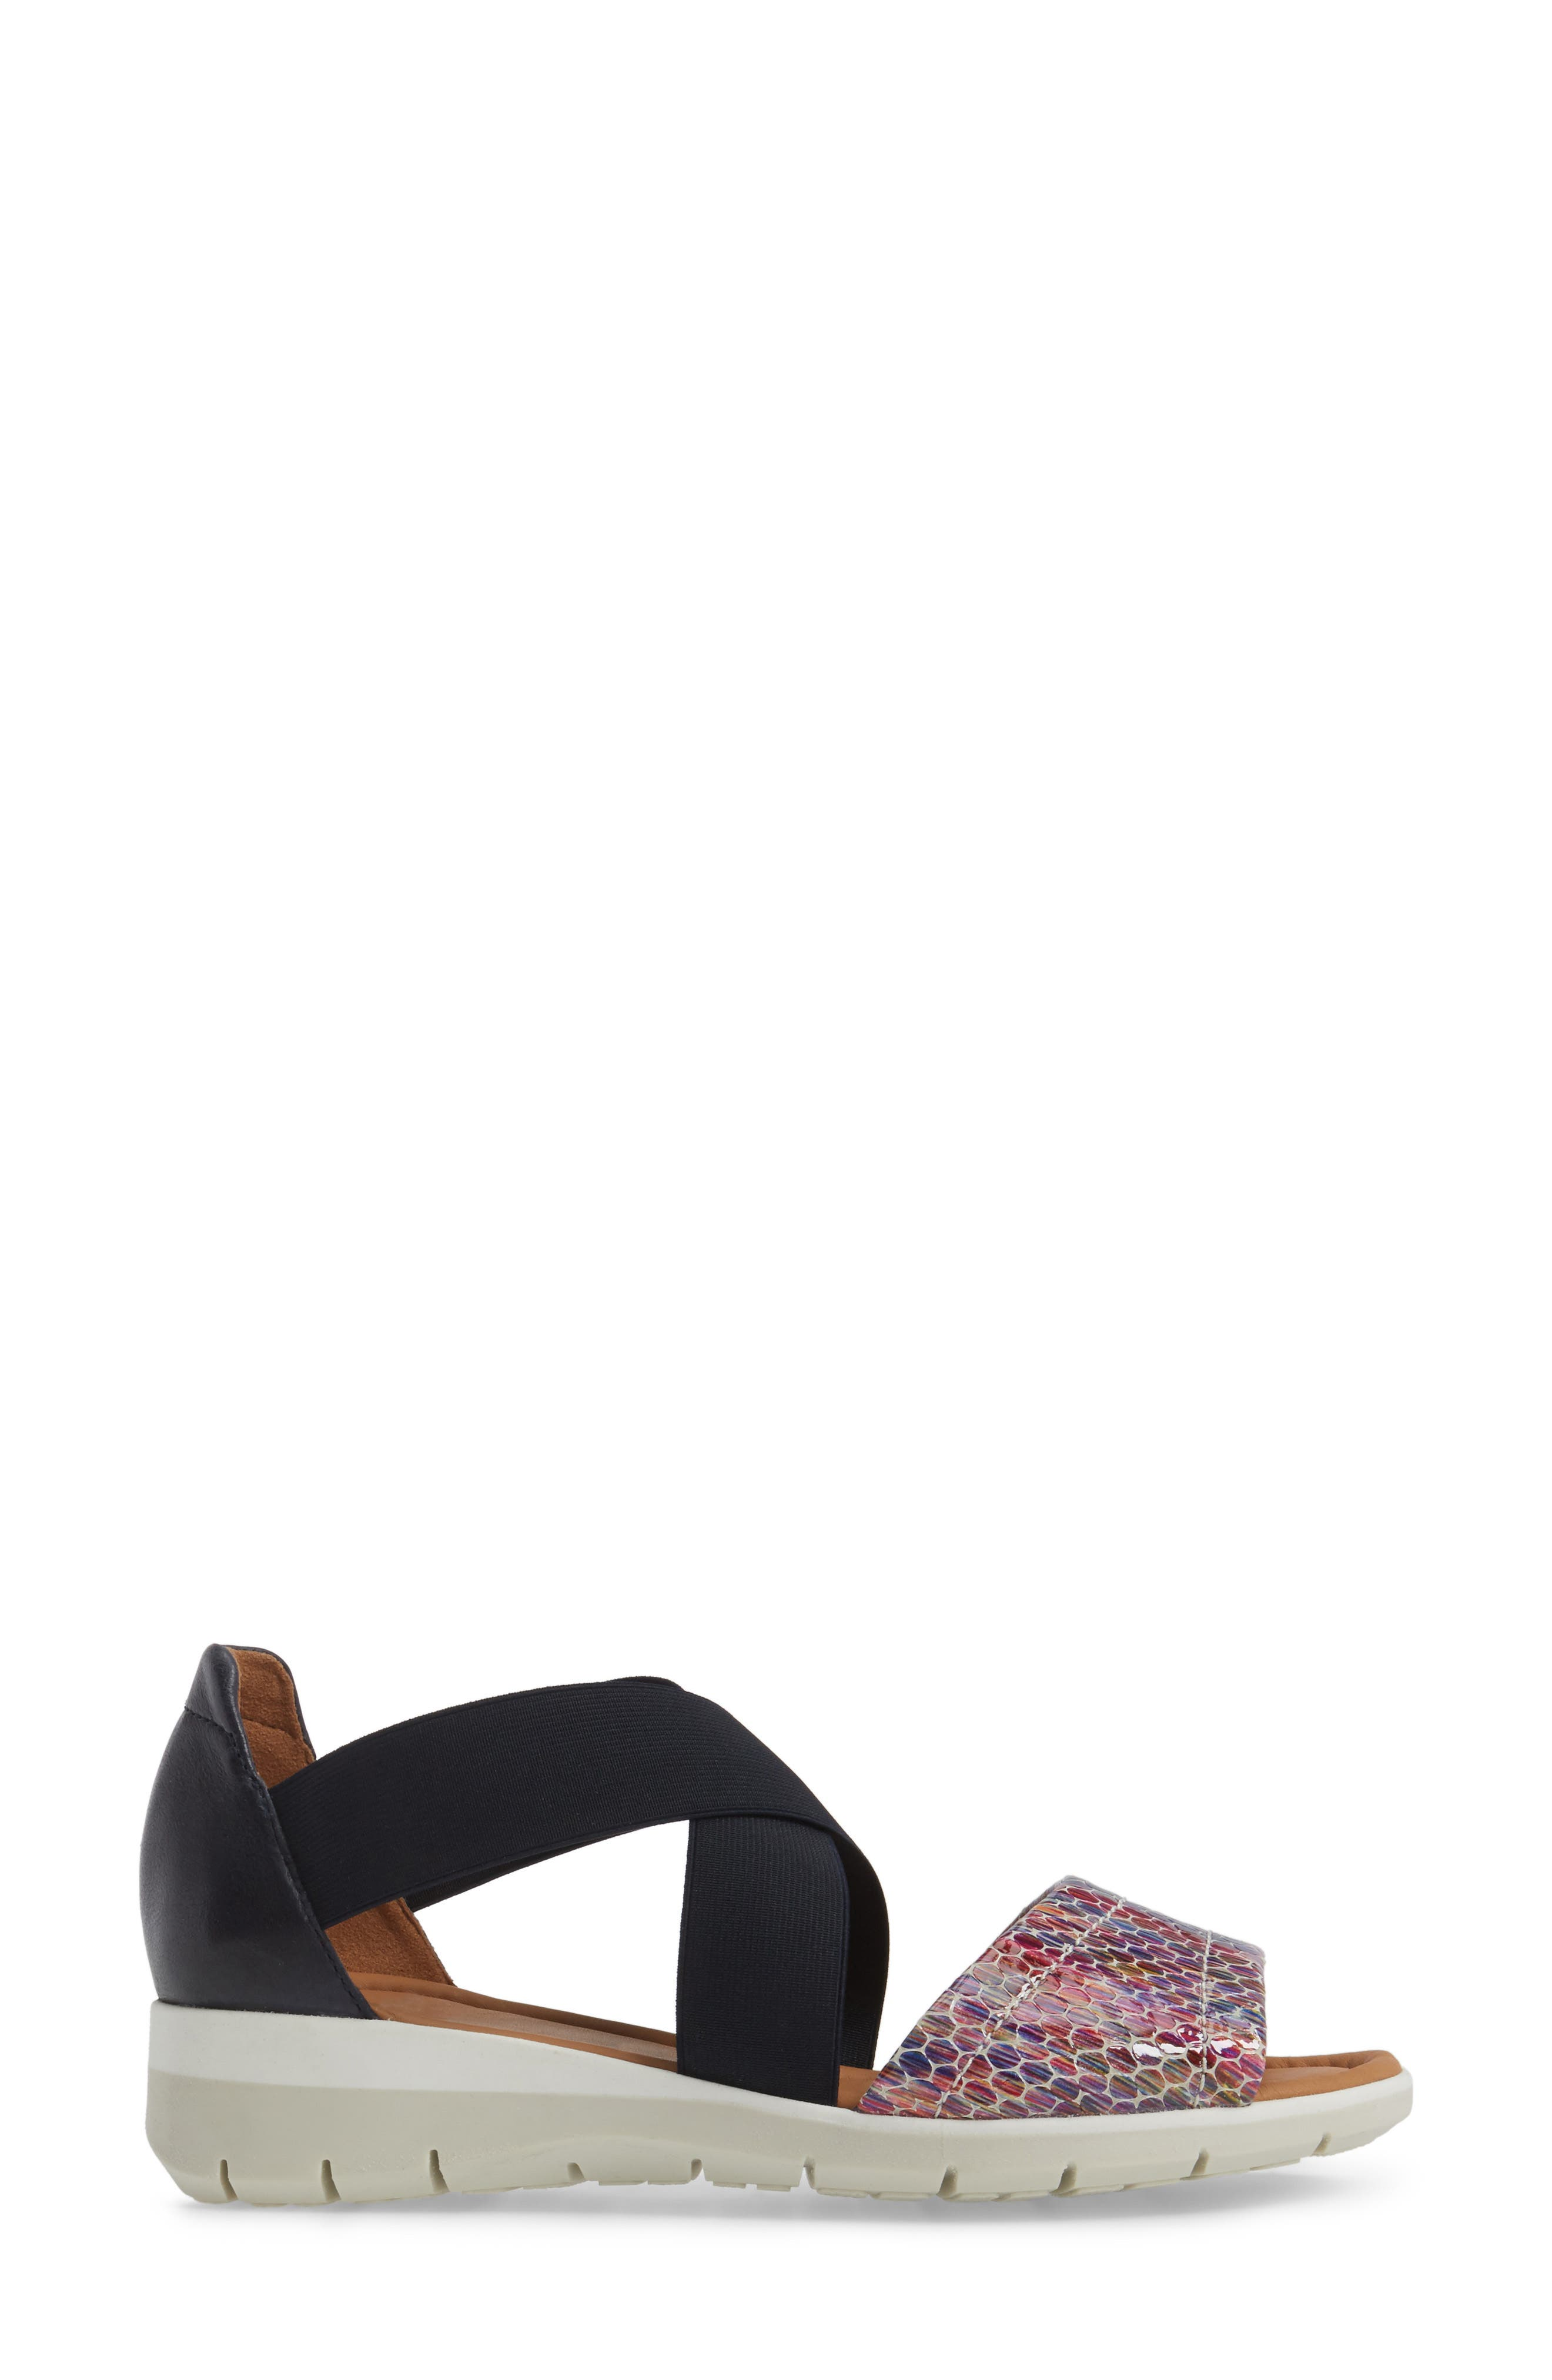 Larissa Cross Strap Wedge Sandal,                             Alternate thumbnail 3, color,                             BLACK MULTI LEATHER